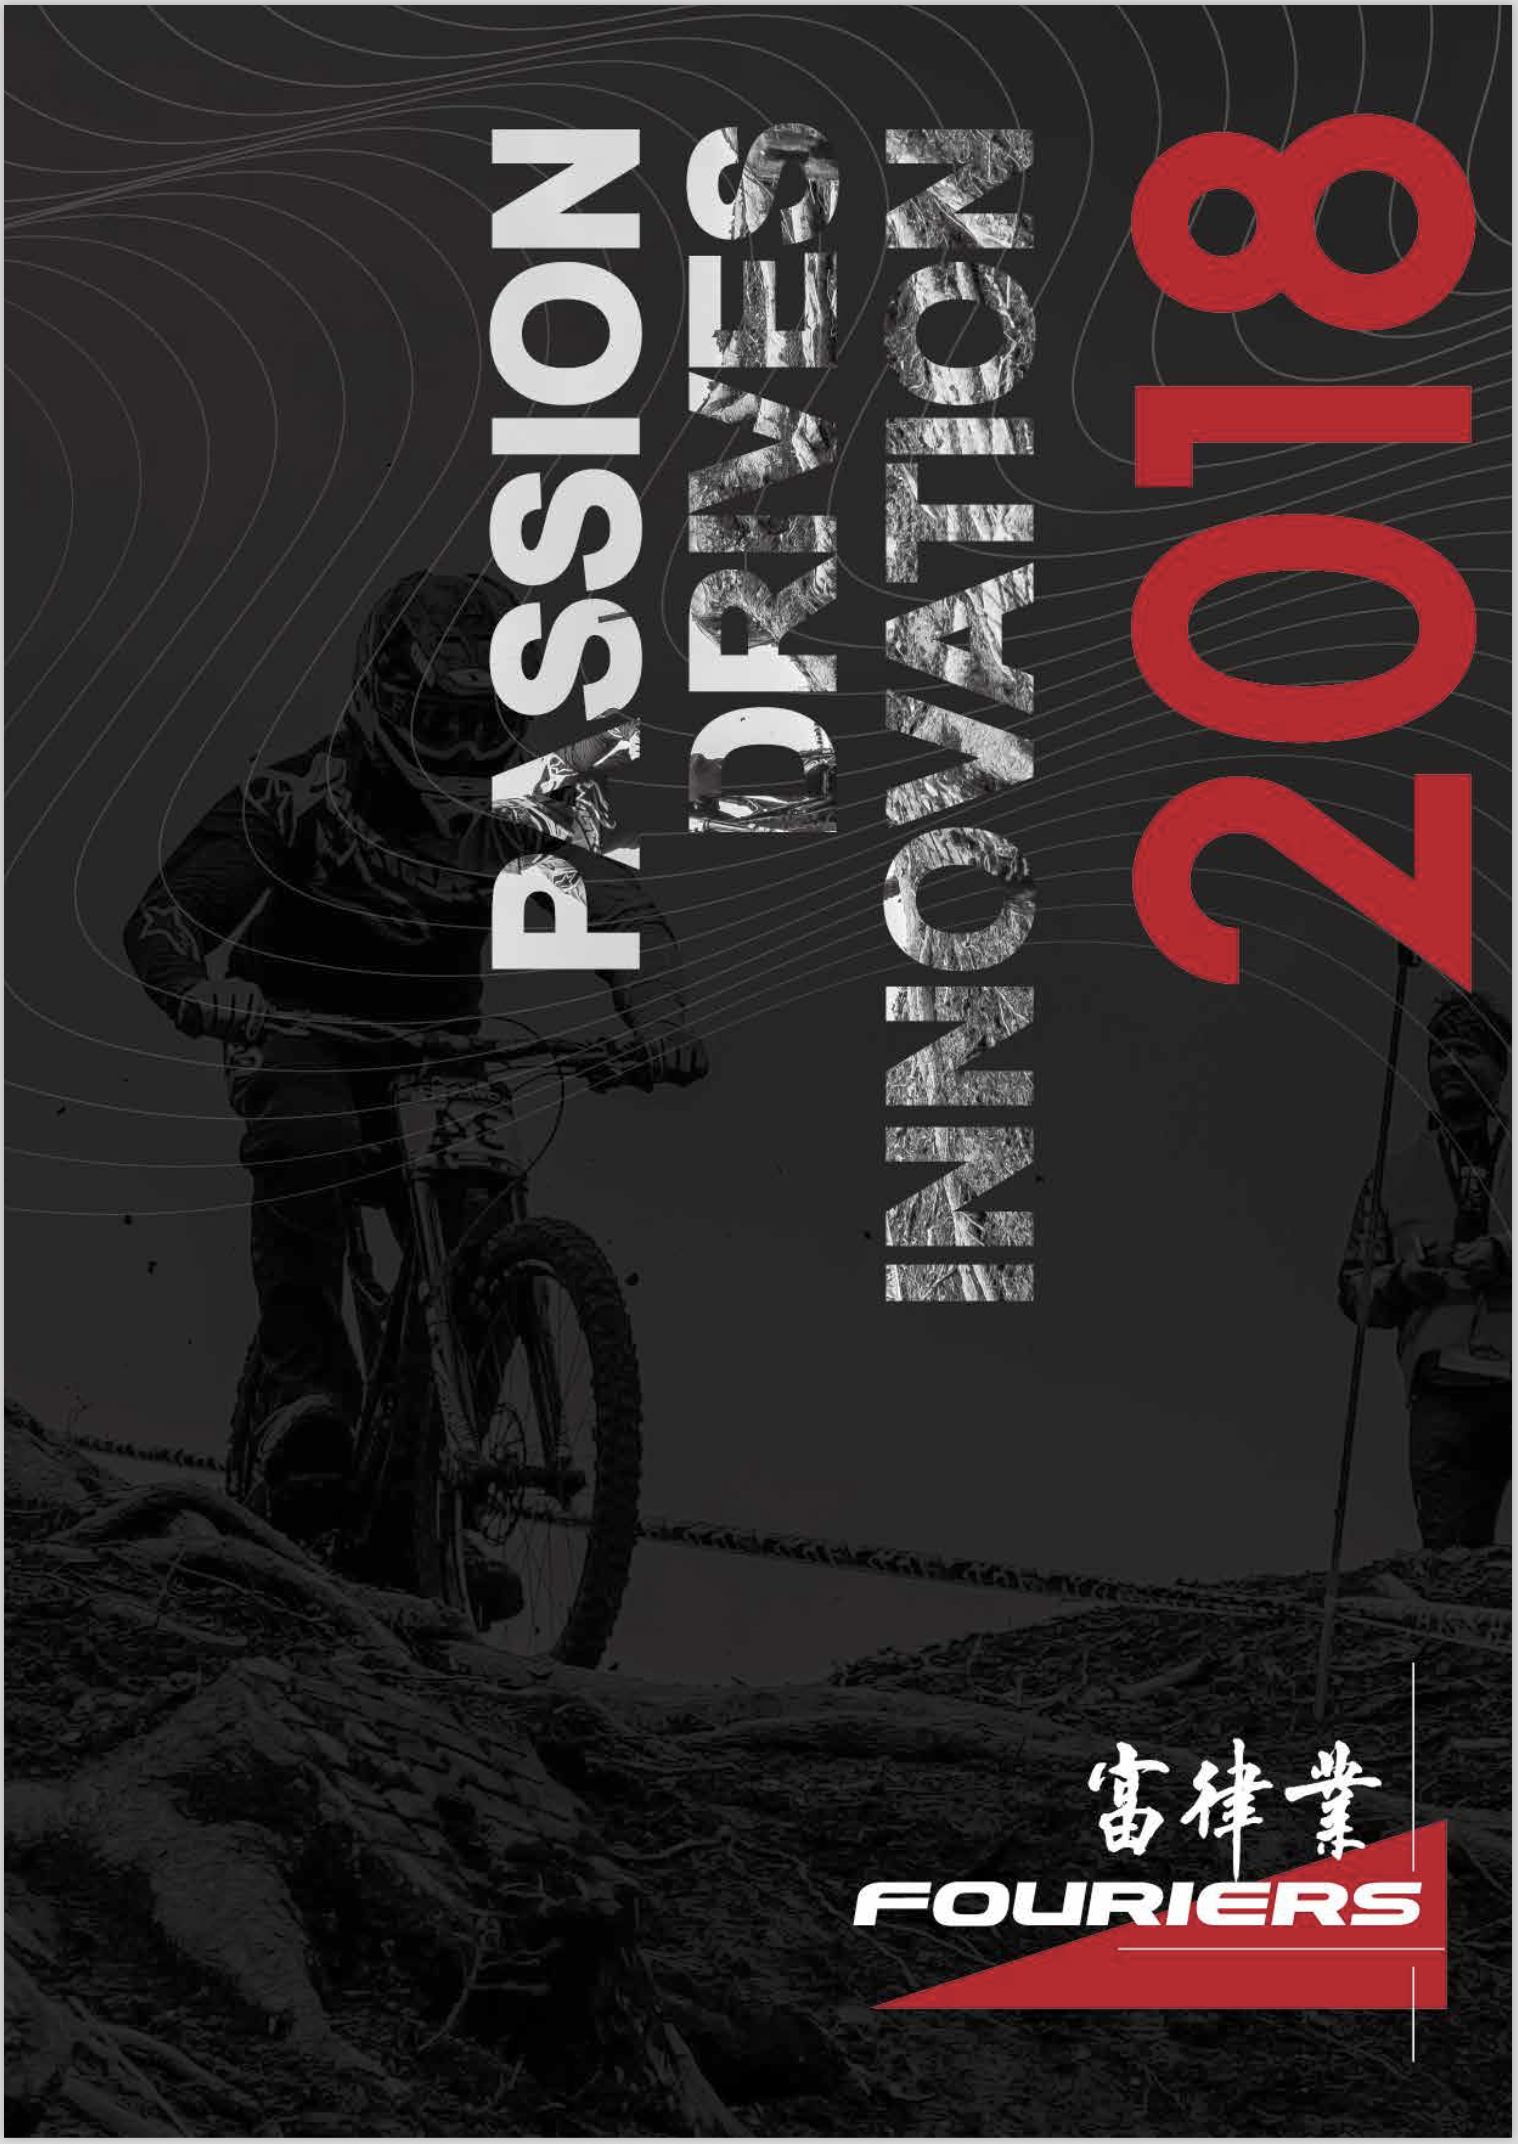 Catalogue Fouriers 2018 sur sucycles.fr